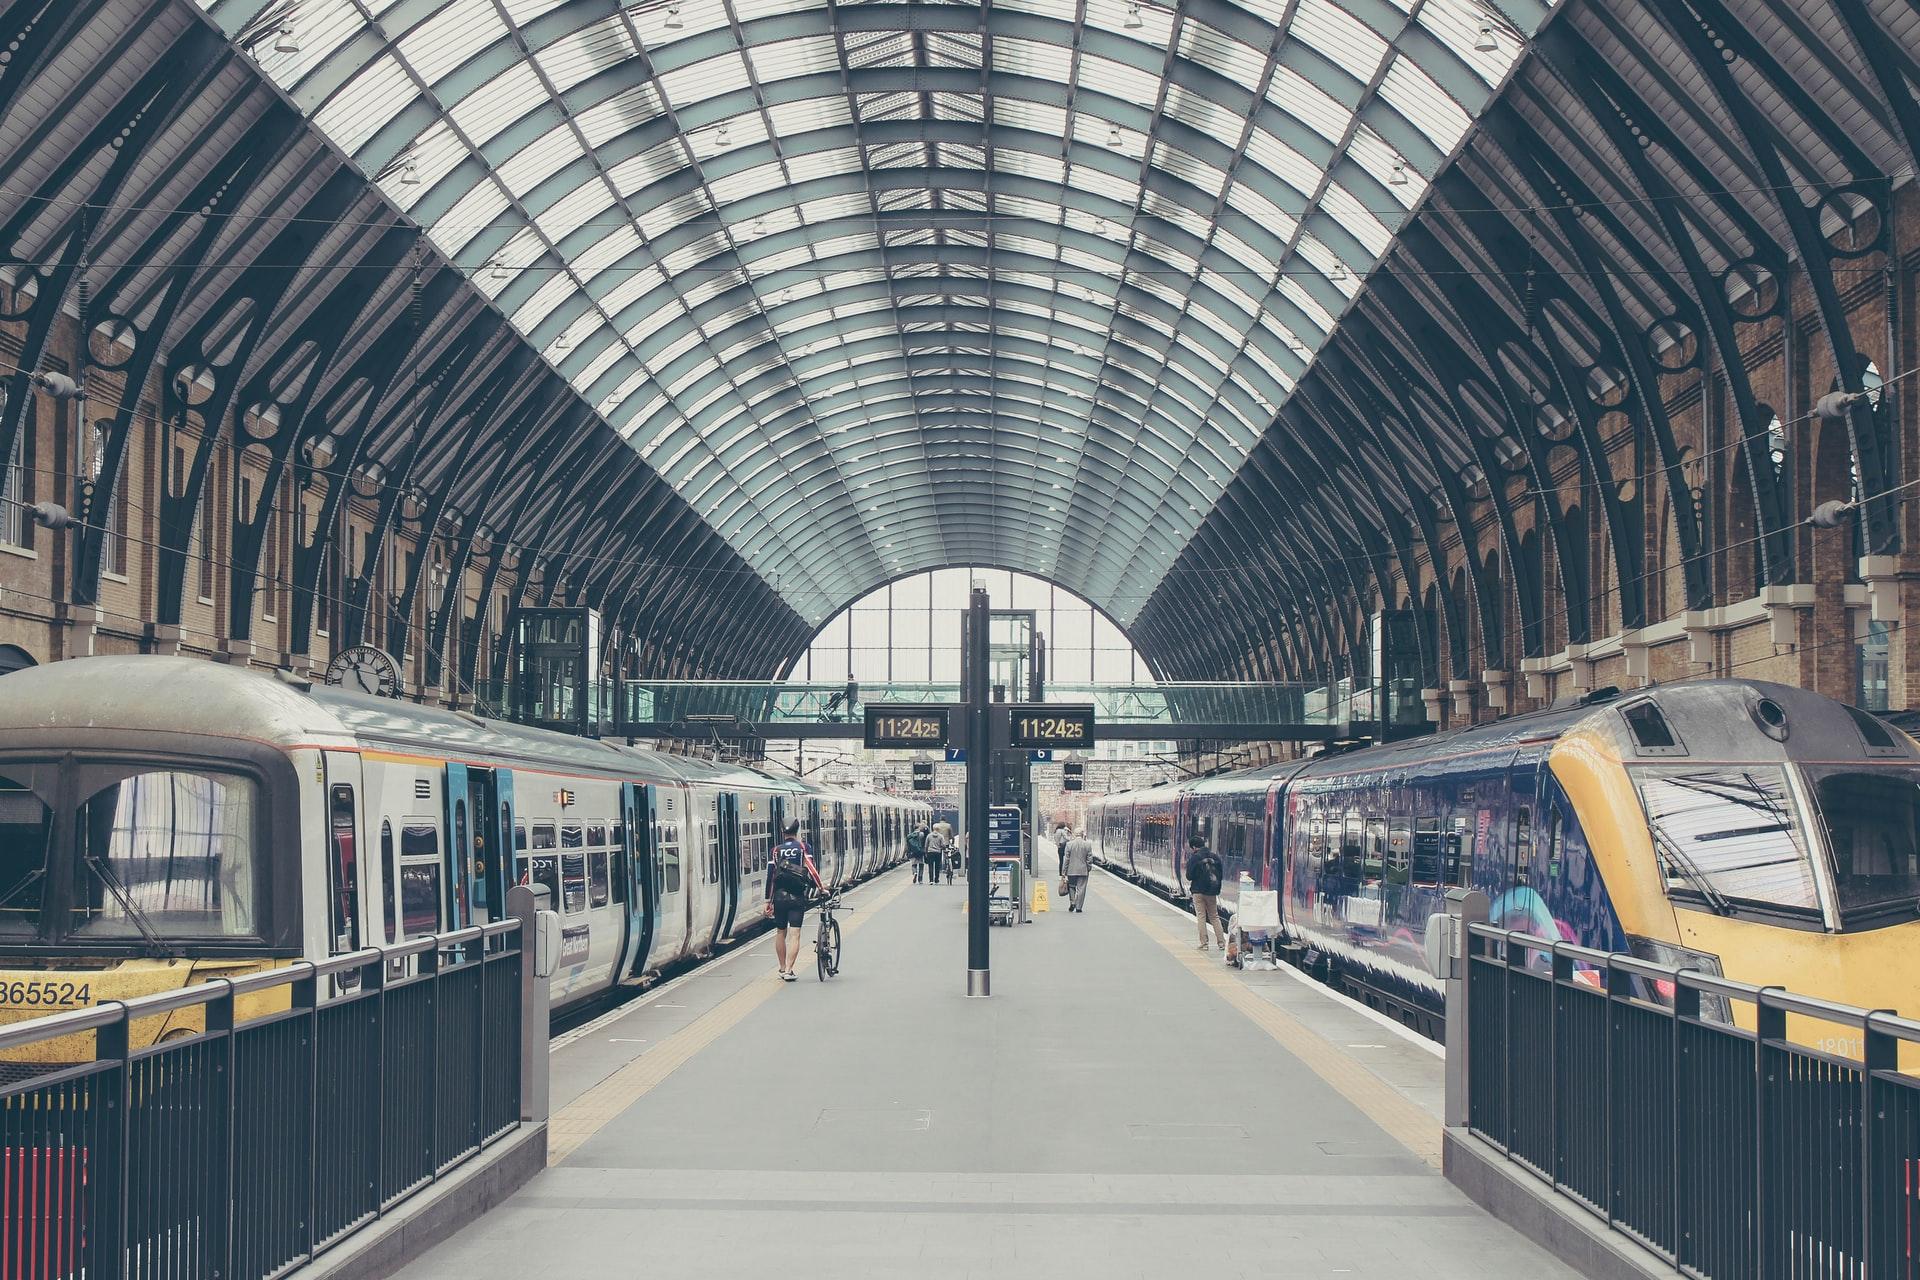 King's Cross Station London. Photo by Michał Parzuchowski Via Unsplash